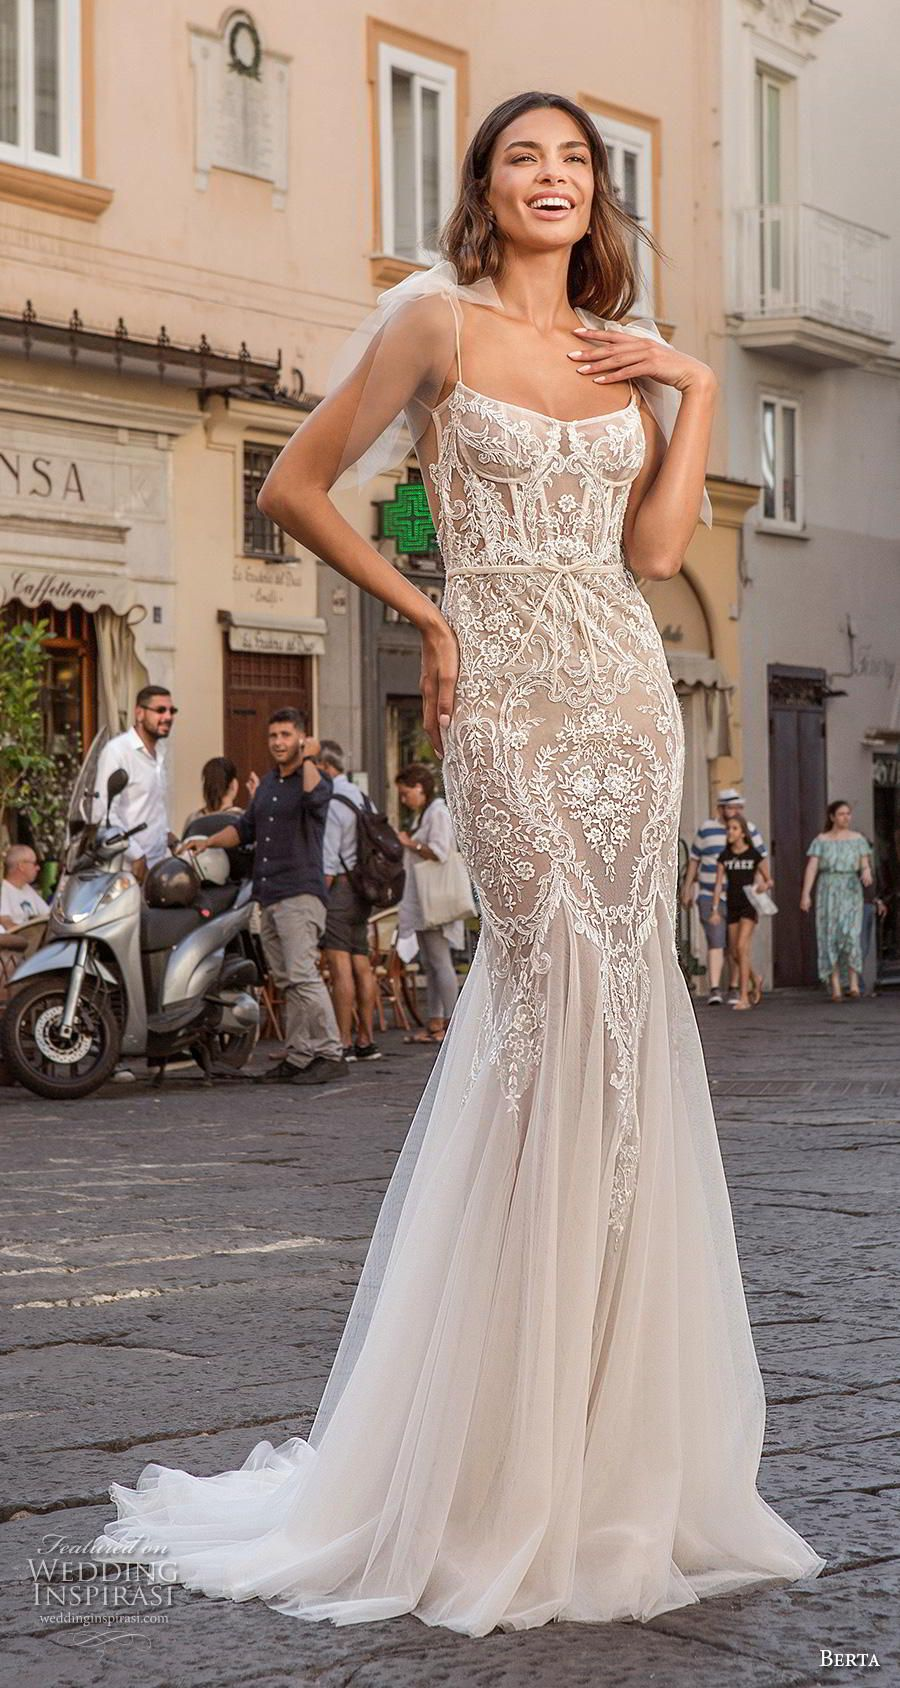 Berta Privee 2020 Wedding Dresses Amalfi Bridal Collection No 3 Wedding Inspirasi Berta Wedding Dress Couture Bridal Gowns Backless Mermaid Wedding Dresses [ 1688 x 900 Pixel ]